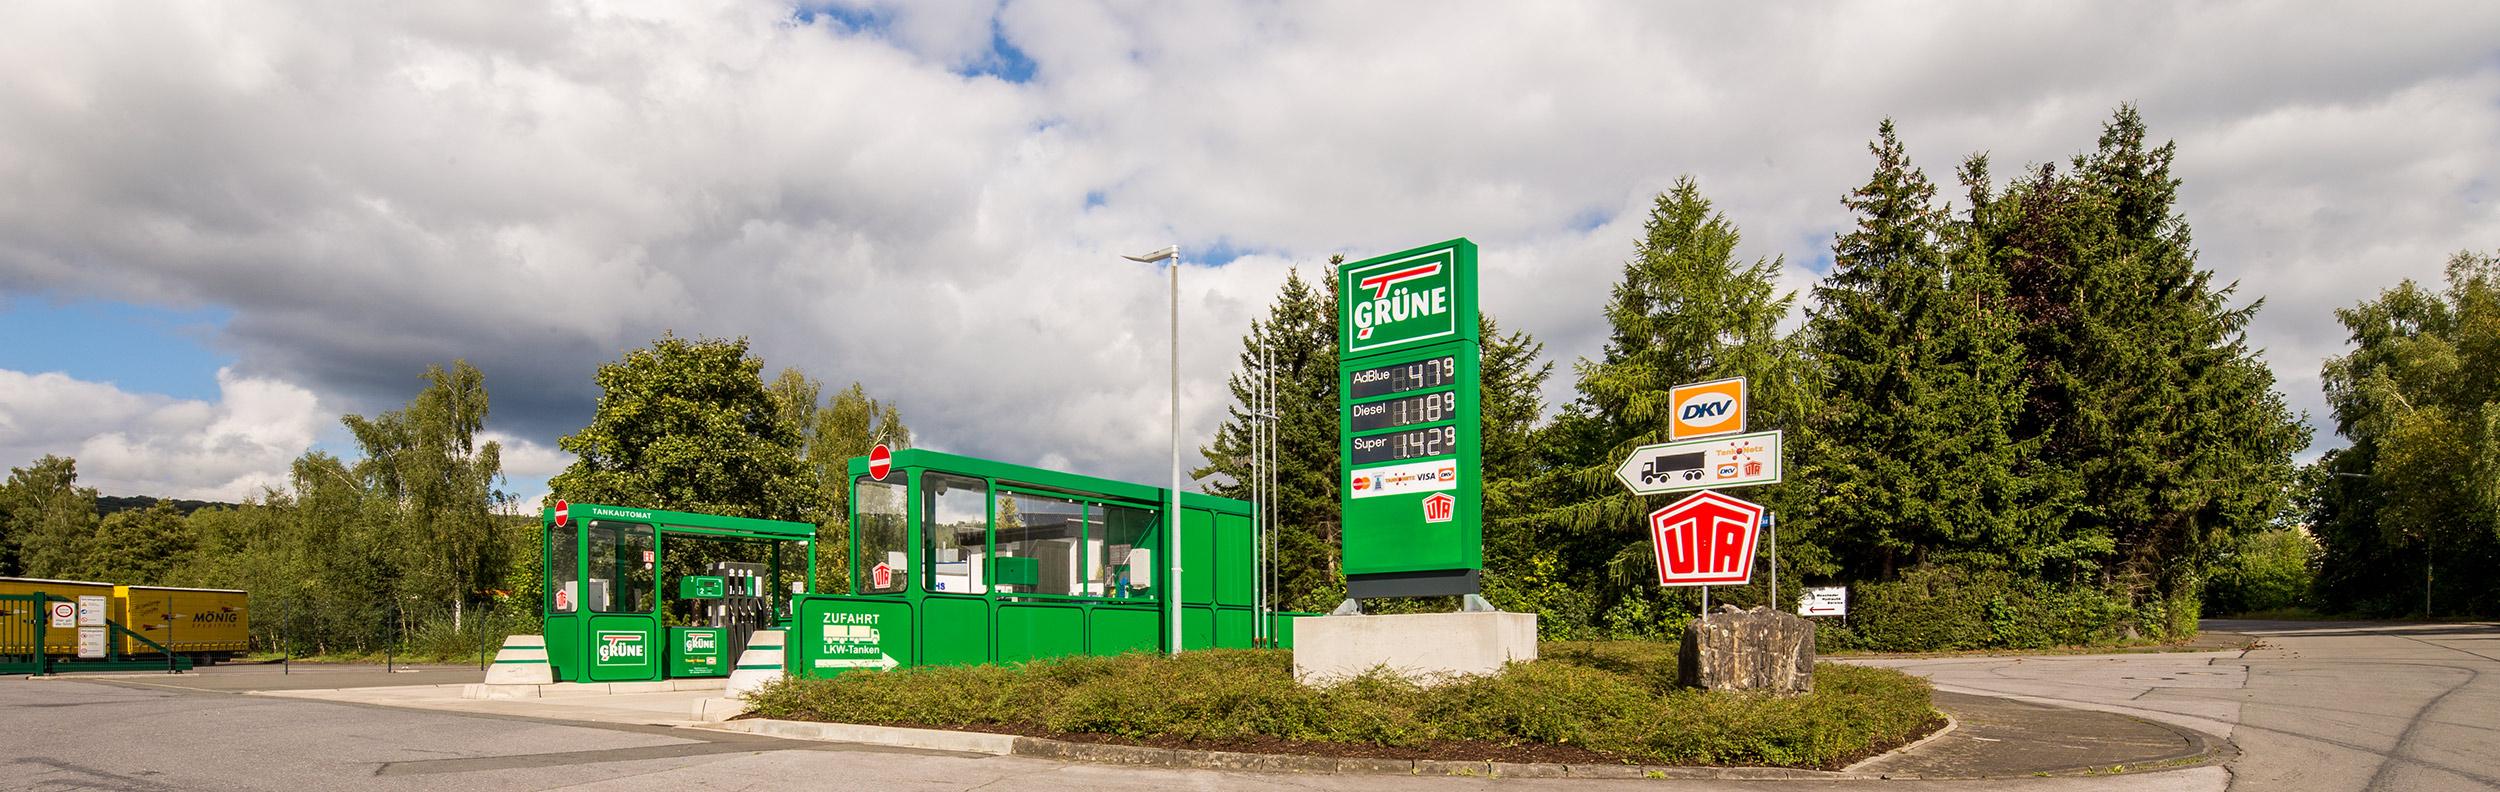 gruene-tankstellen-sauerland-003